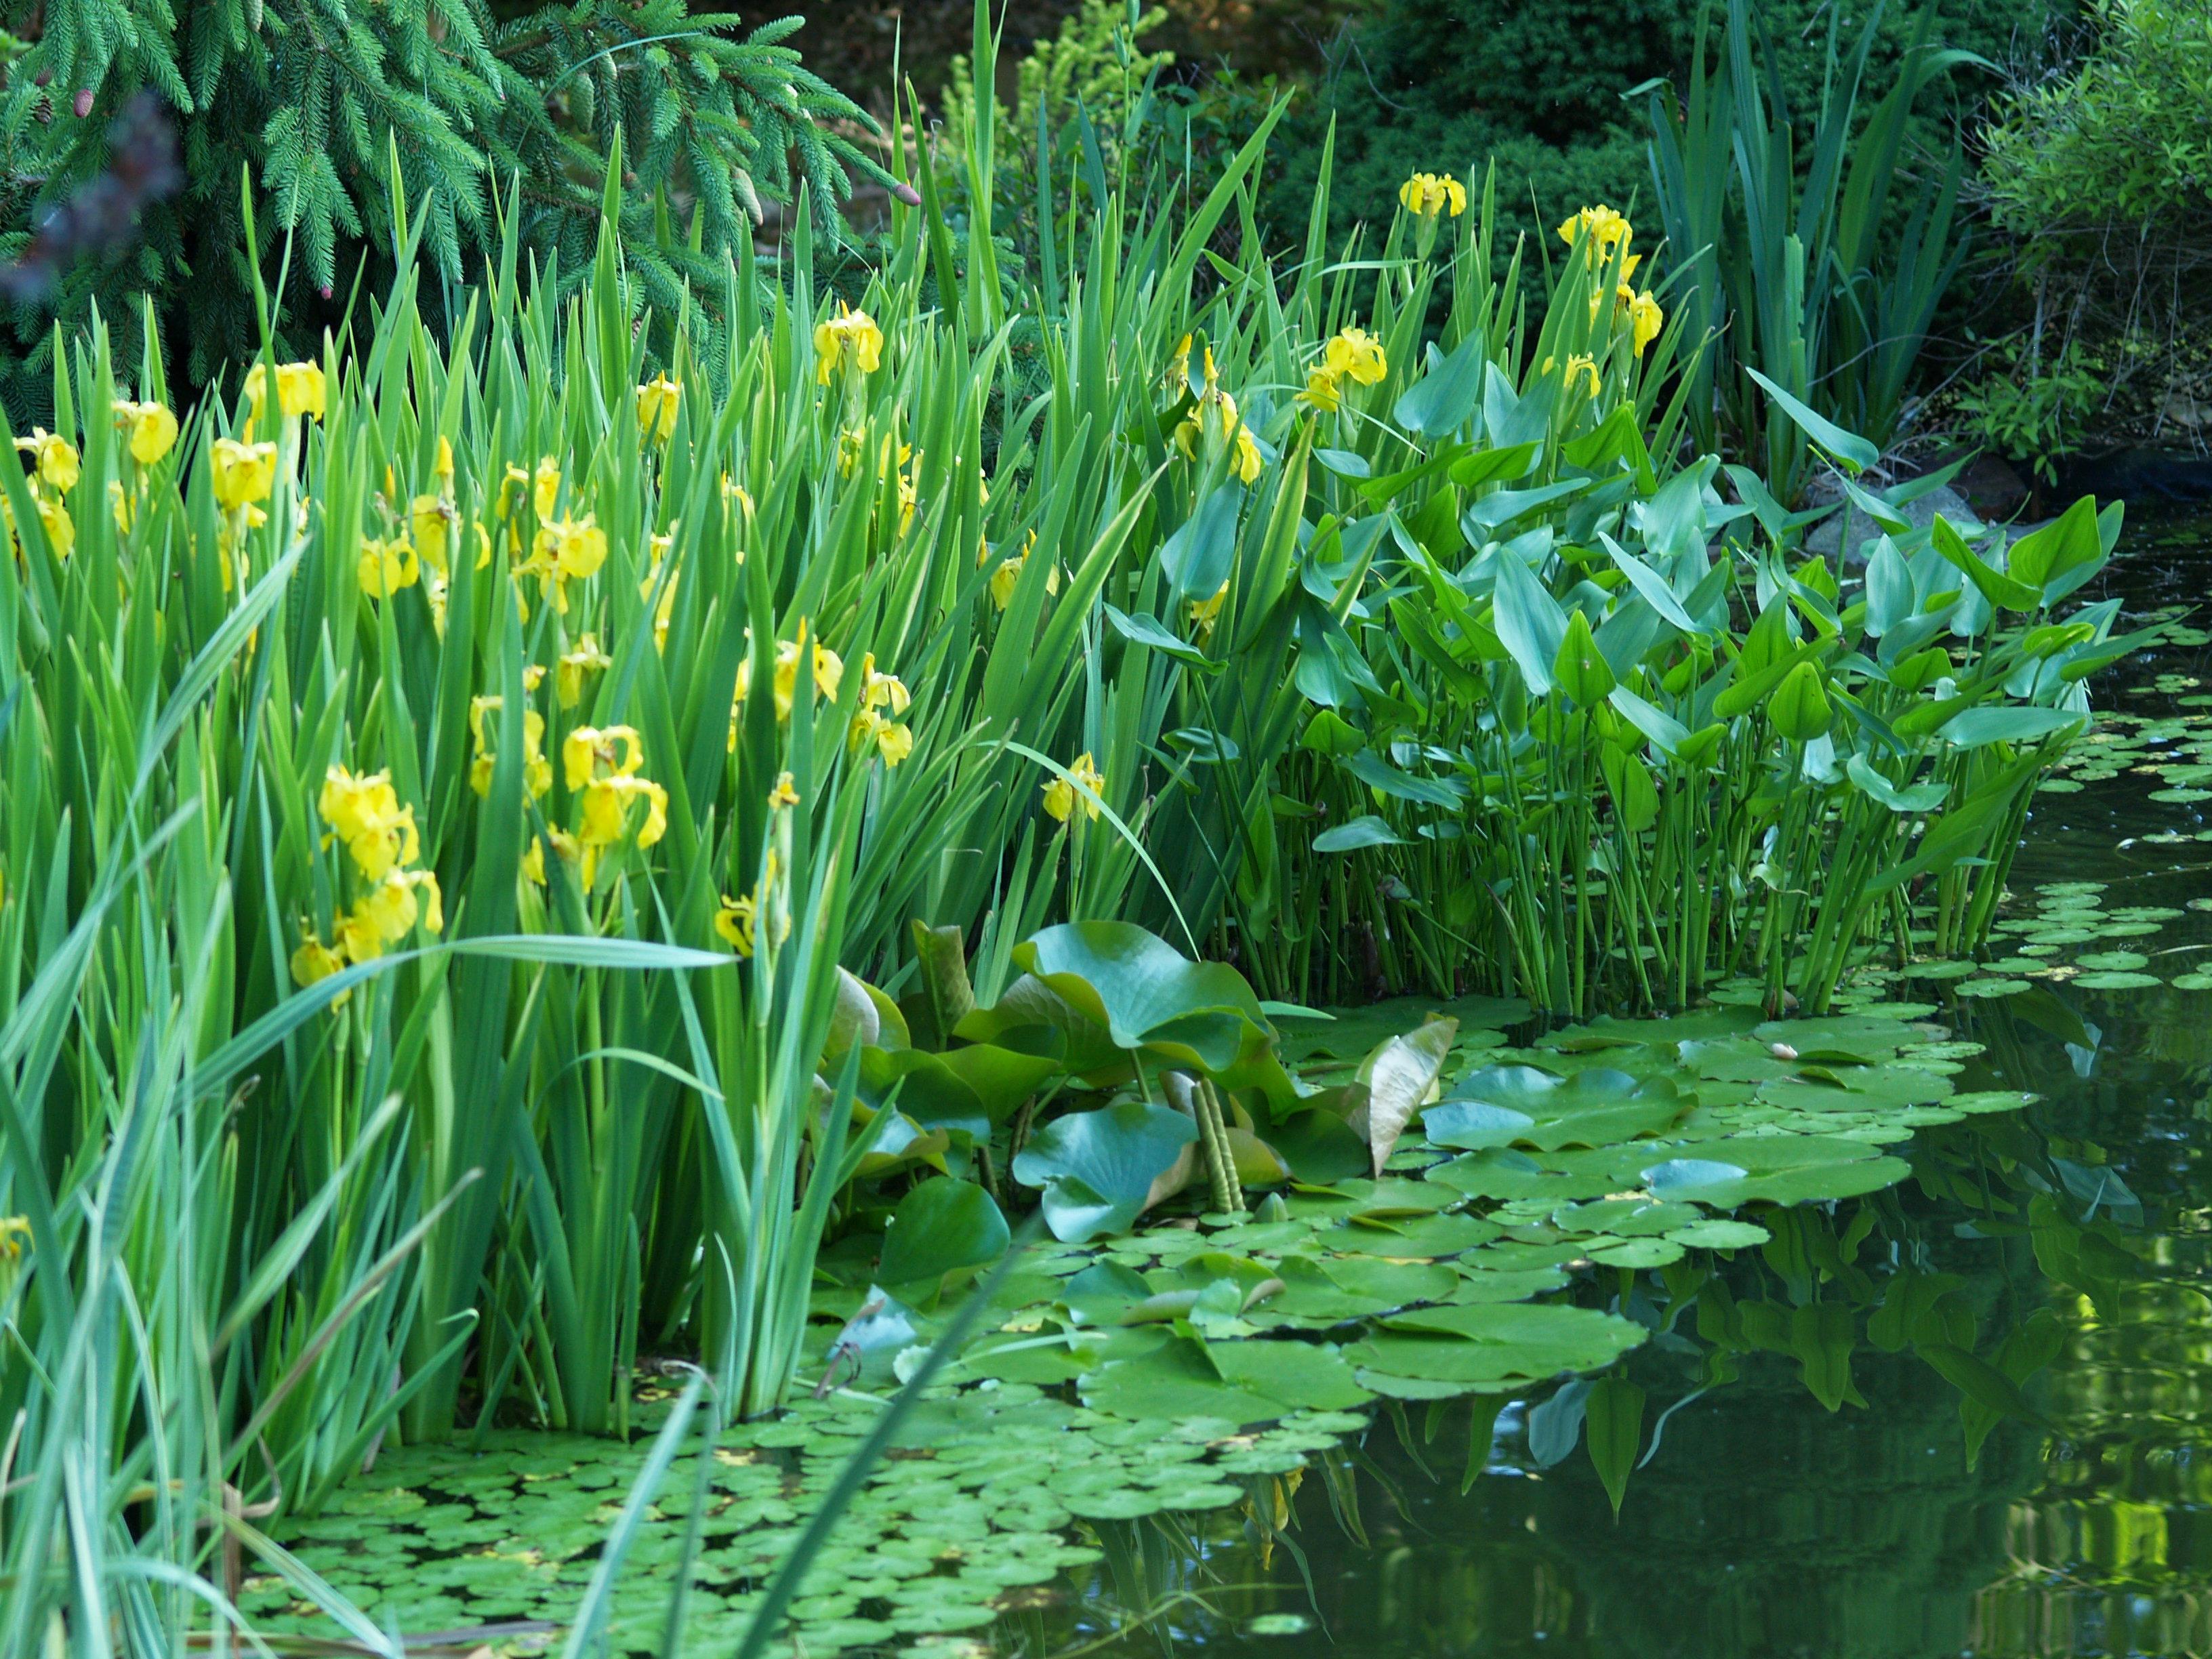 Japanese maples ramblin 39 through dave 39 s garden for Japanese water plants